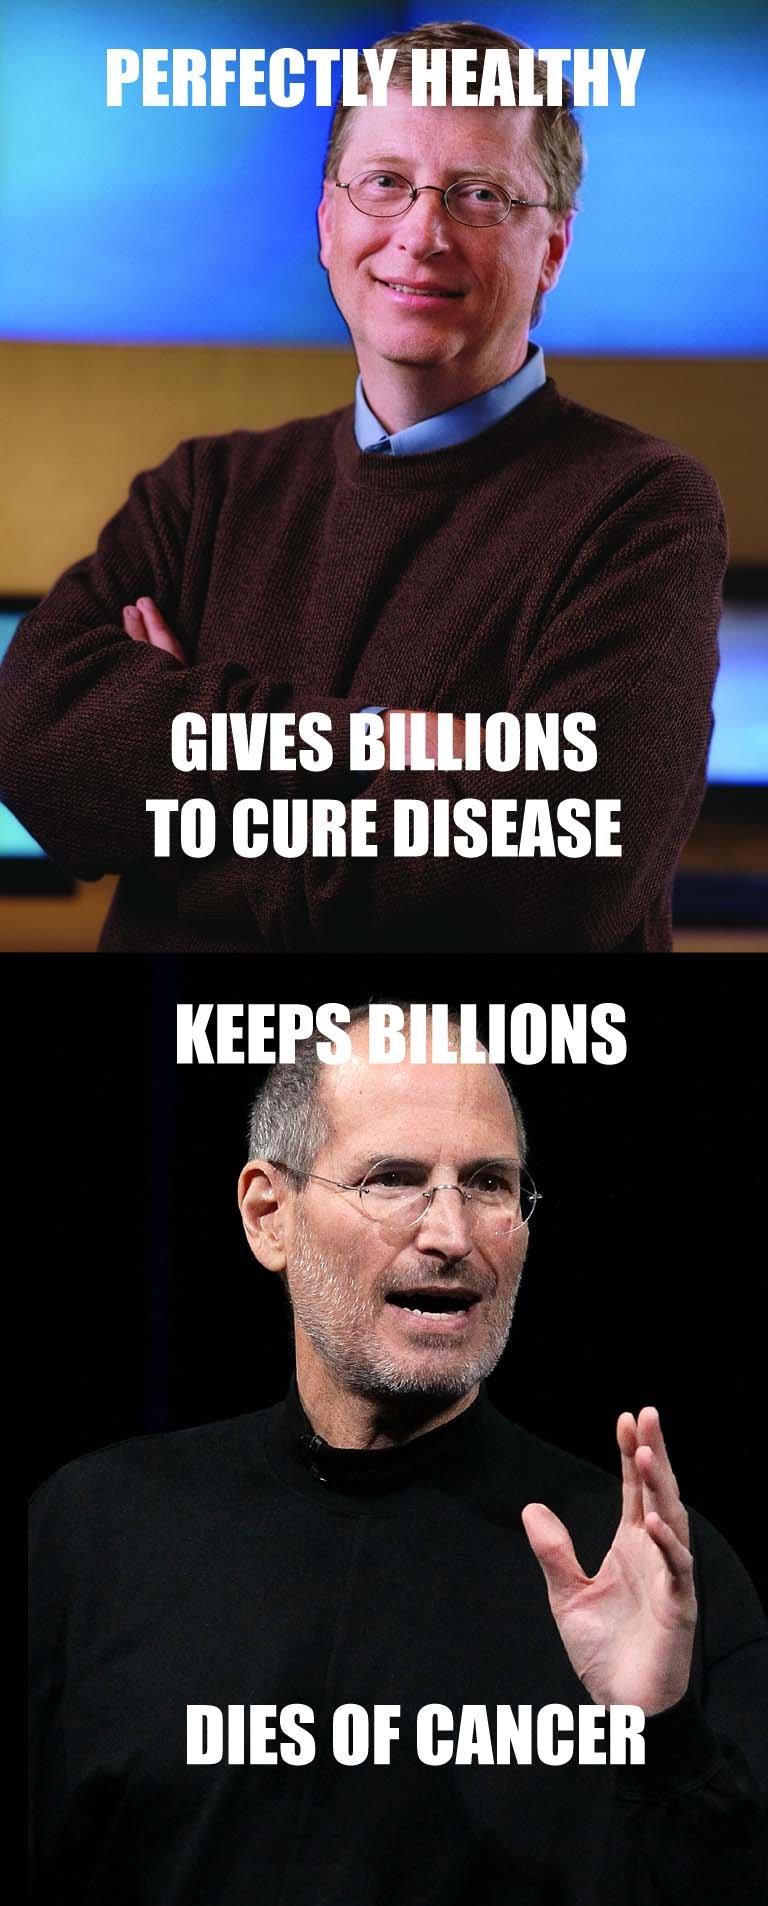 GGG vs Scumbag Steve. Good Guy Gates vs. Scumbag Steve Jobs.. Karma's a bitch, huh?